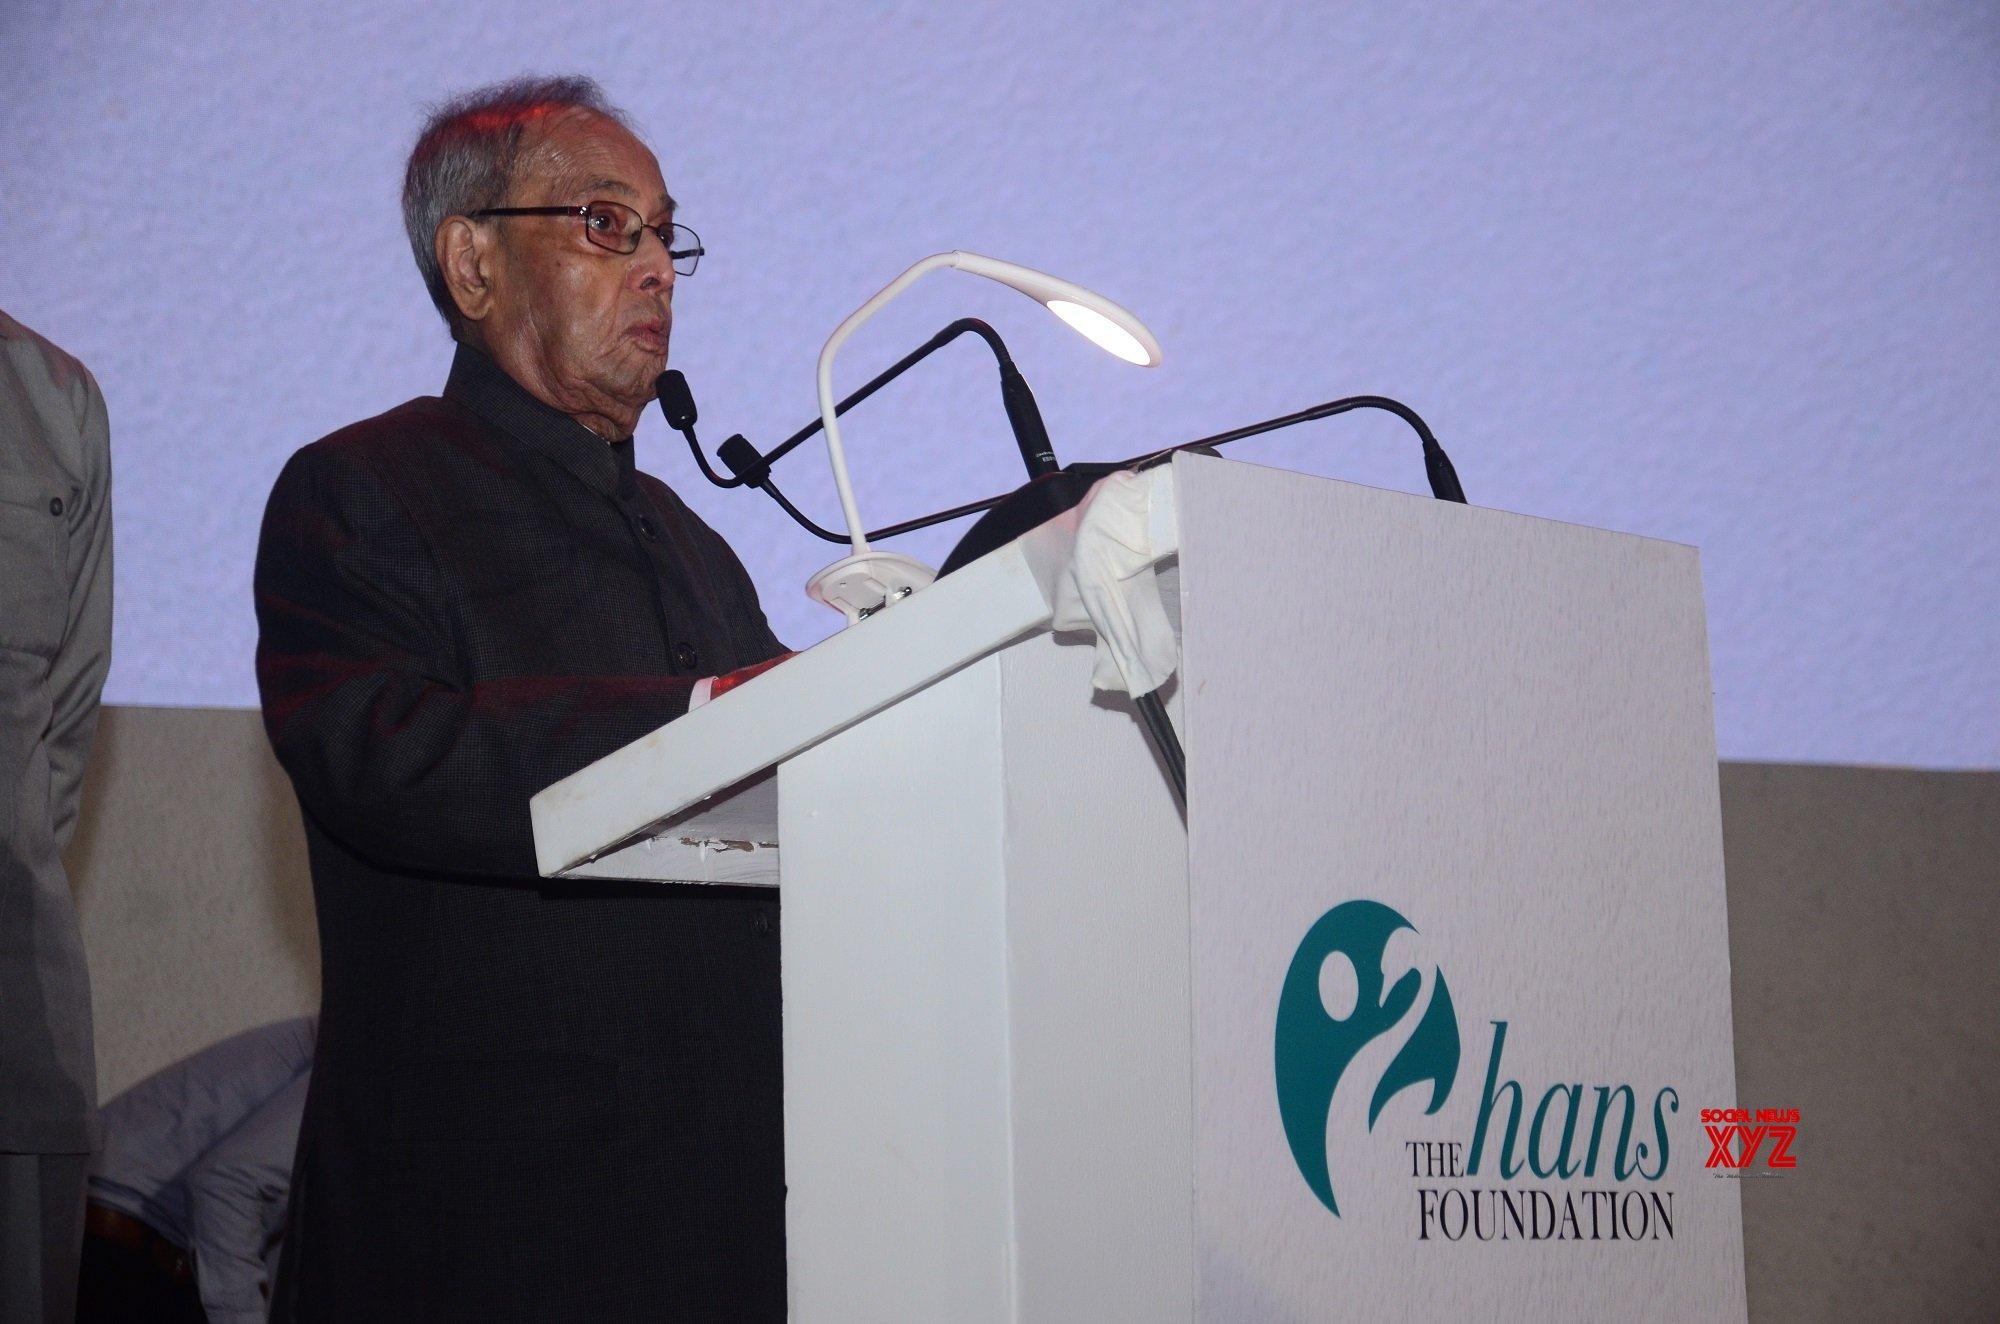 New Delhi: Hans Foundation's 10th anniversary - Pranab Mukherjee #Gallery